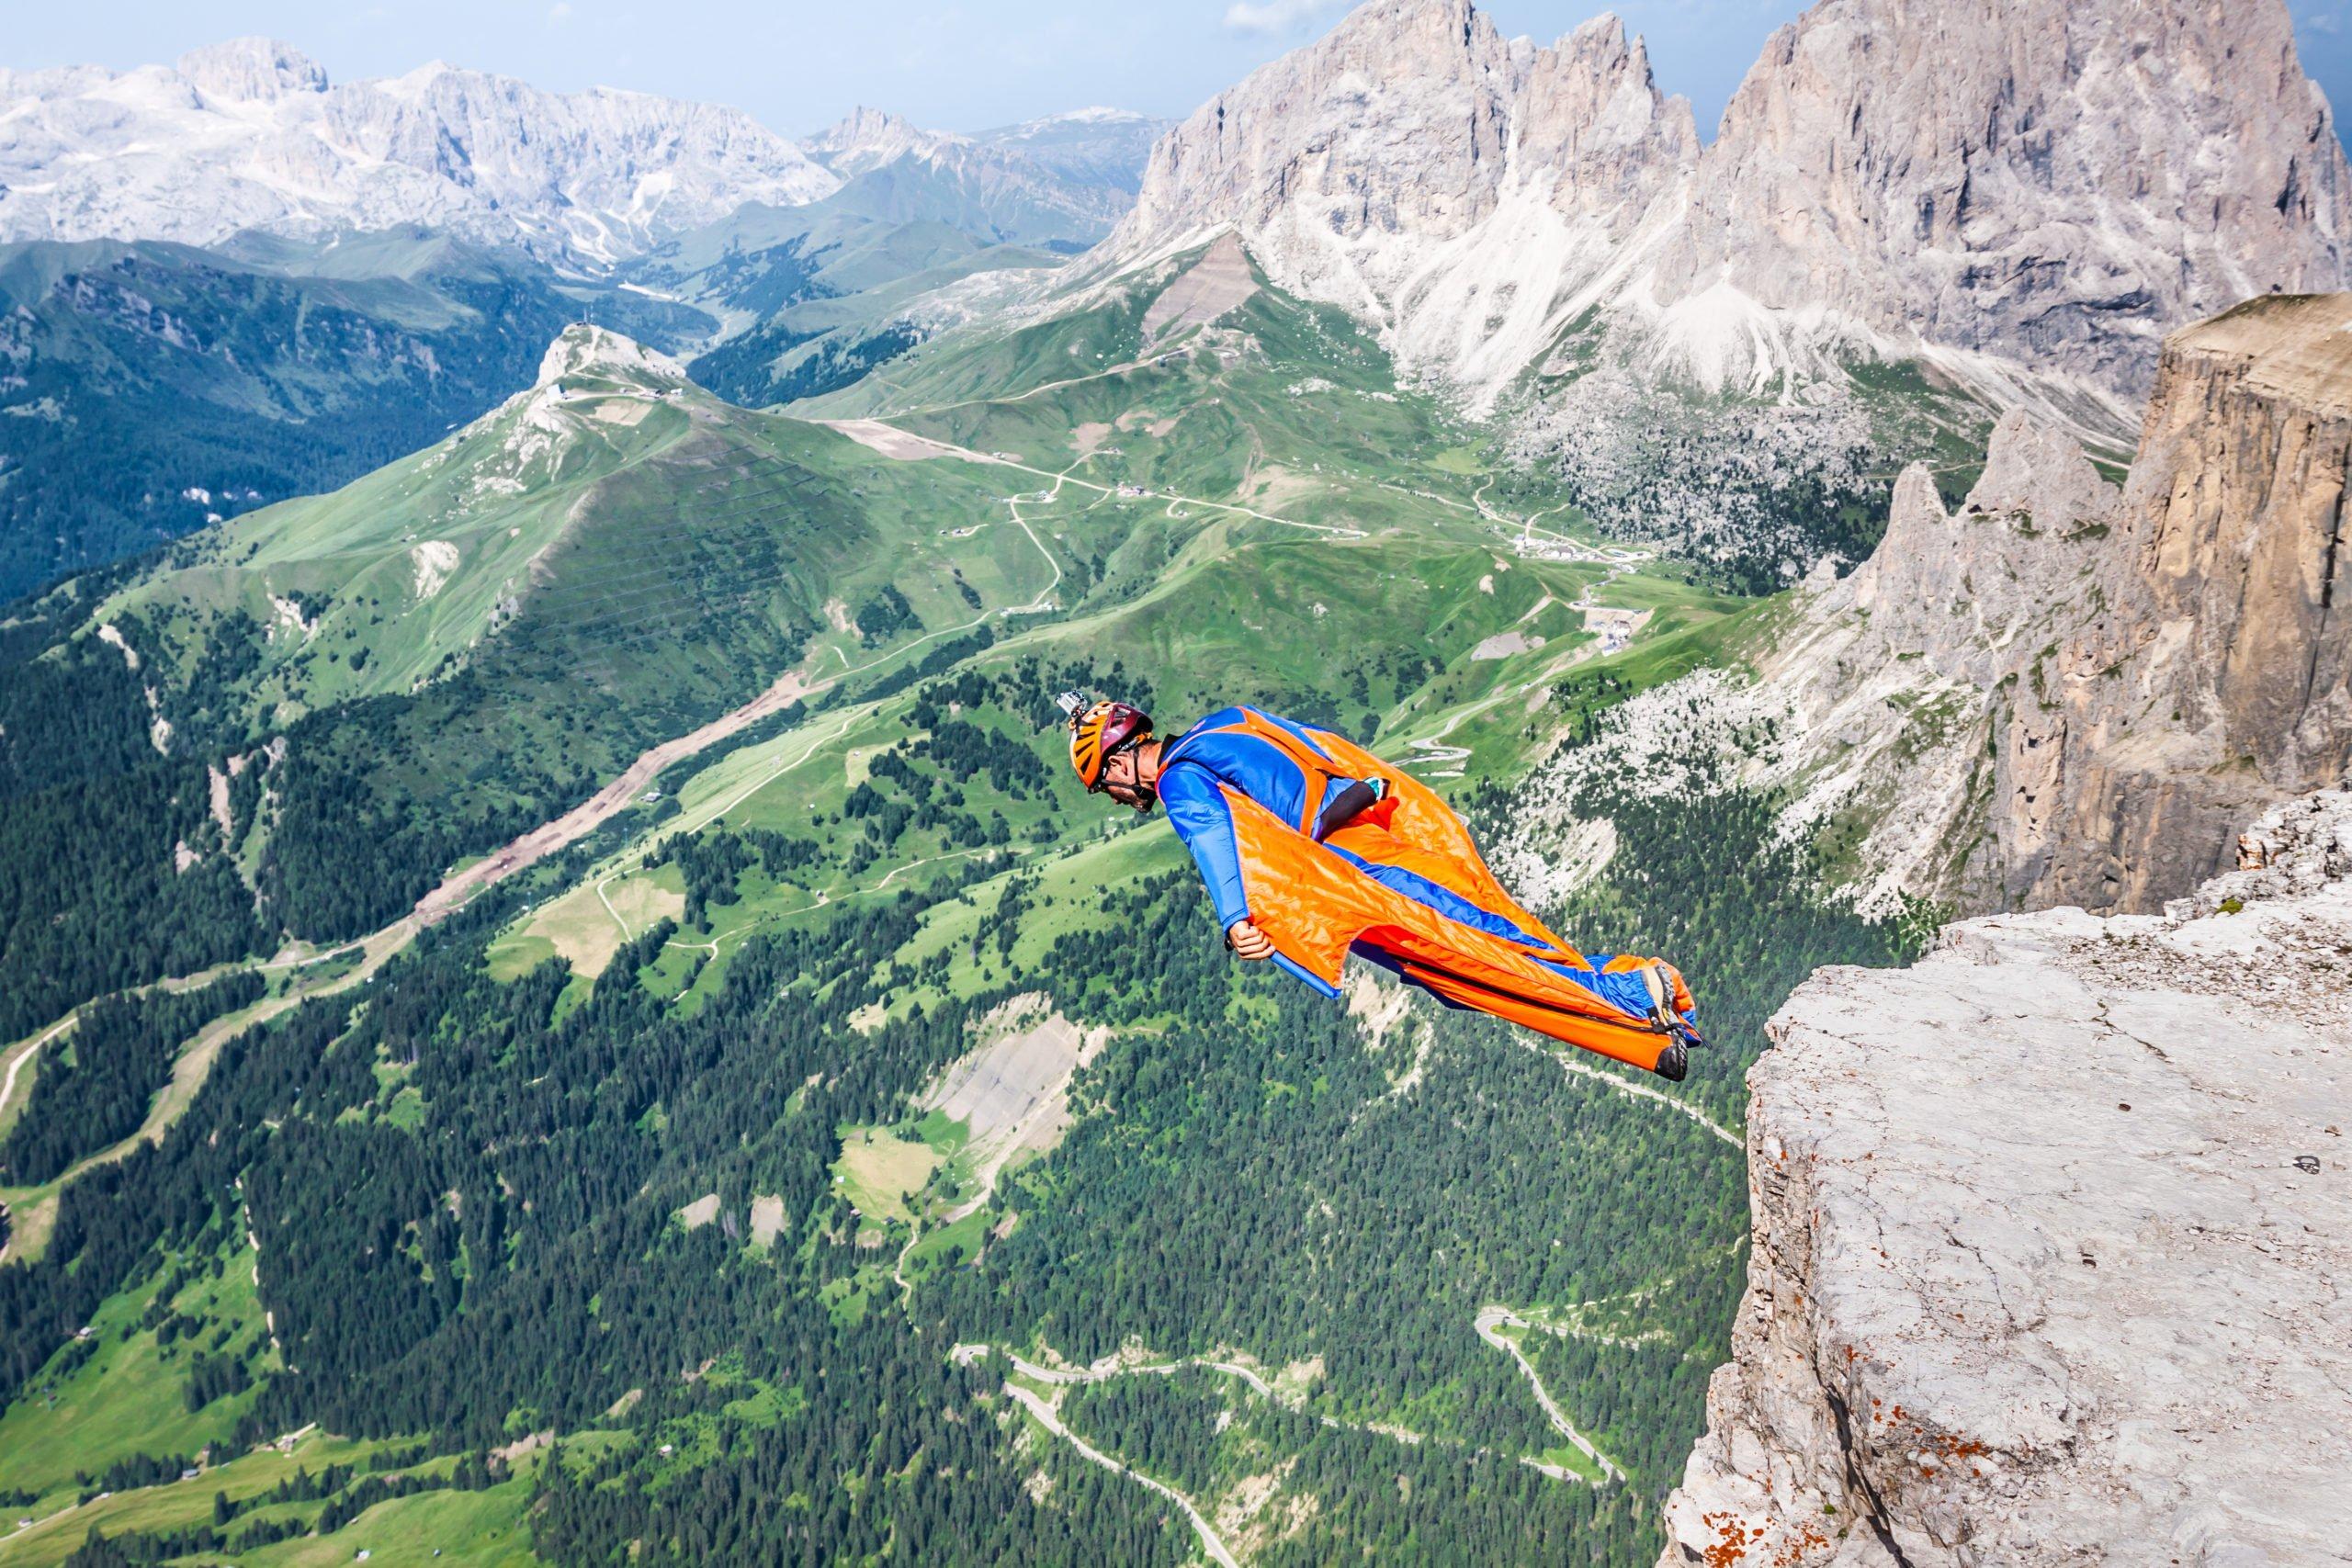 jump, parachute